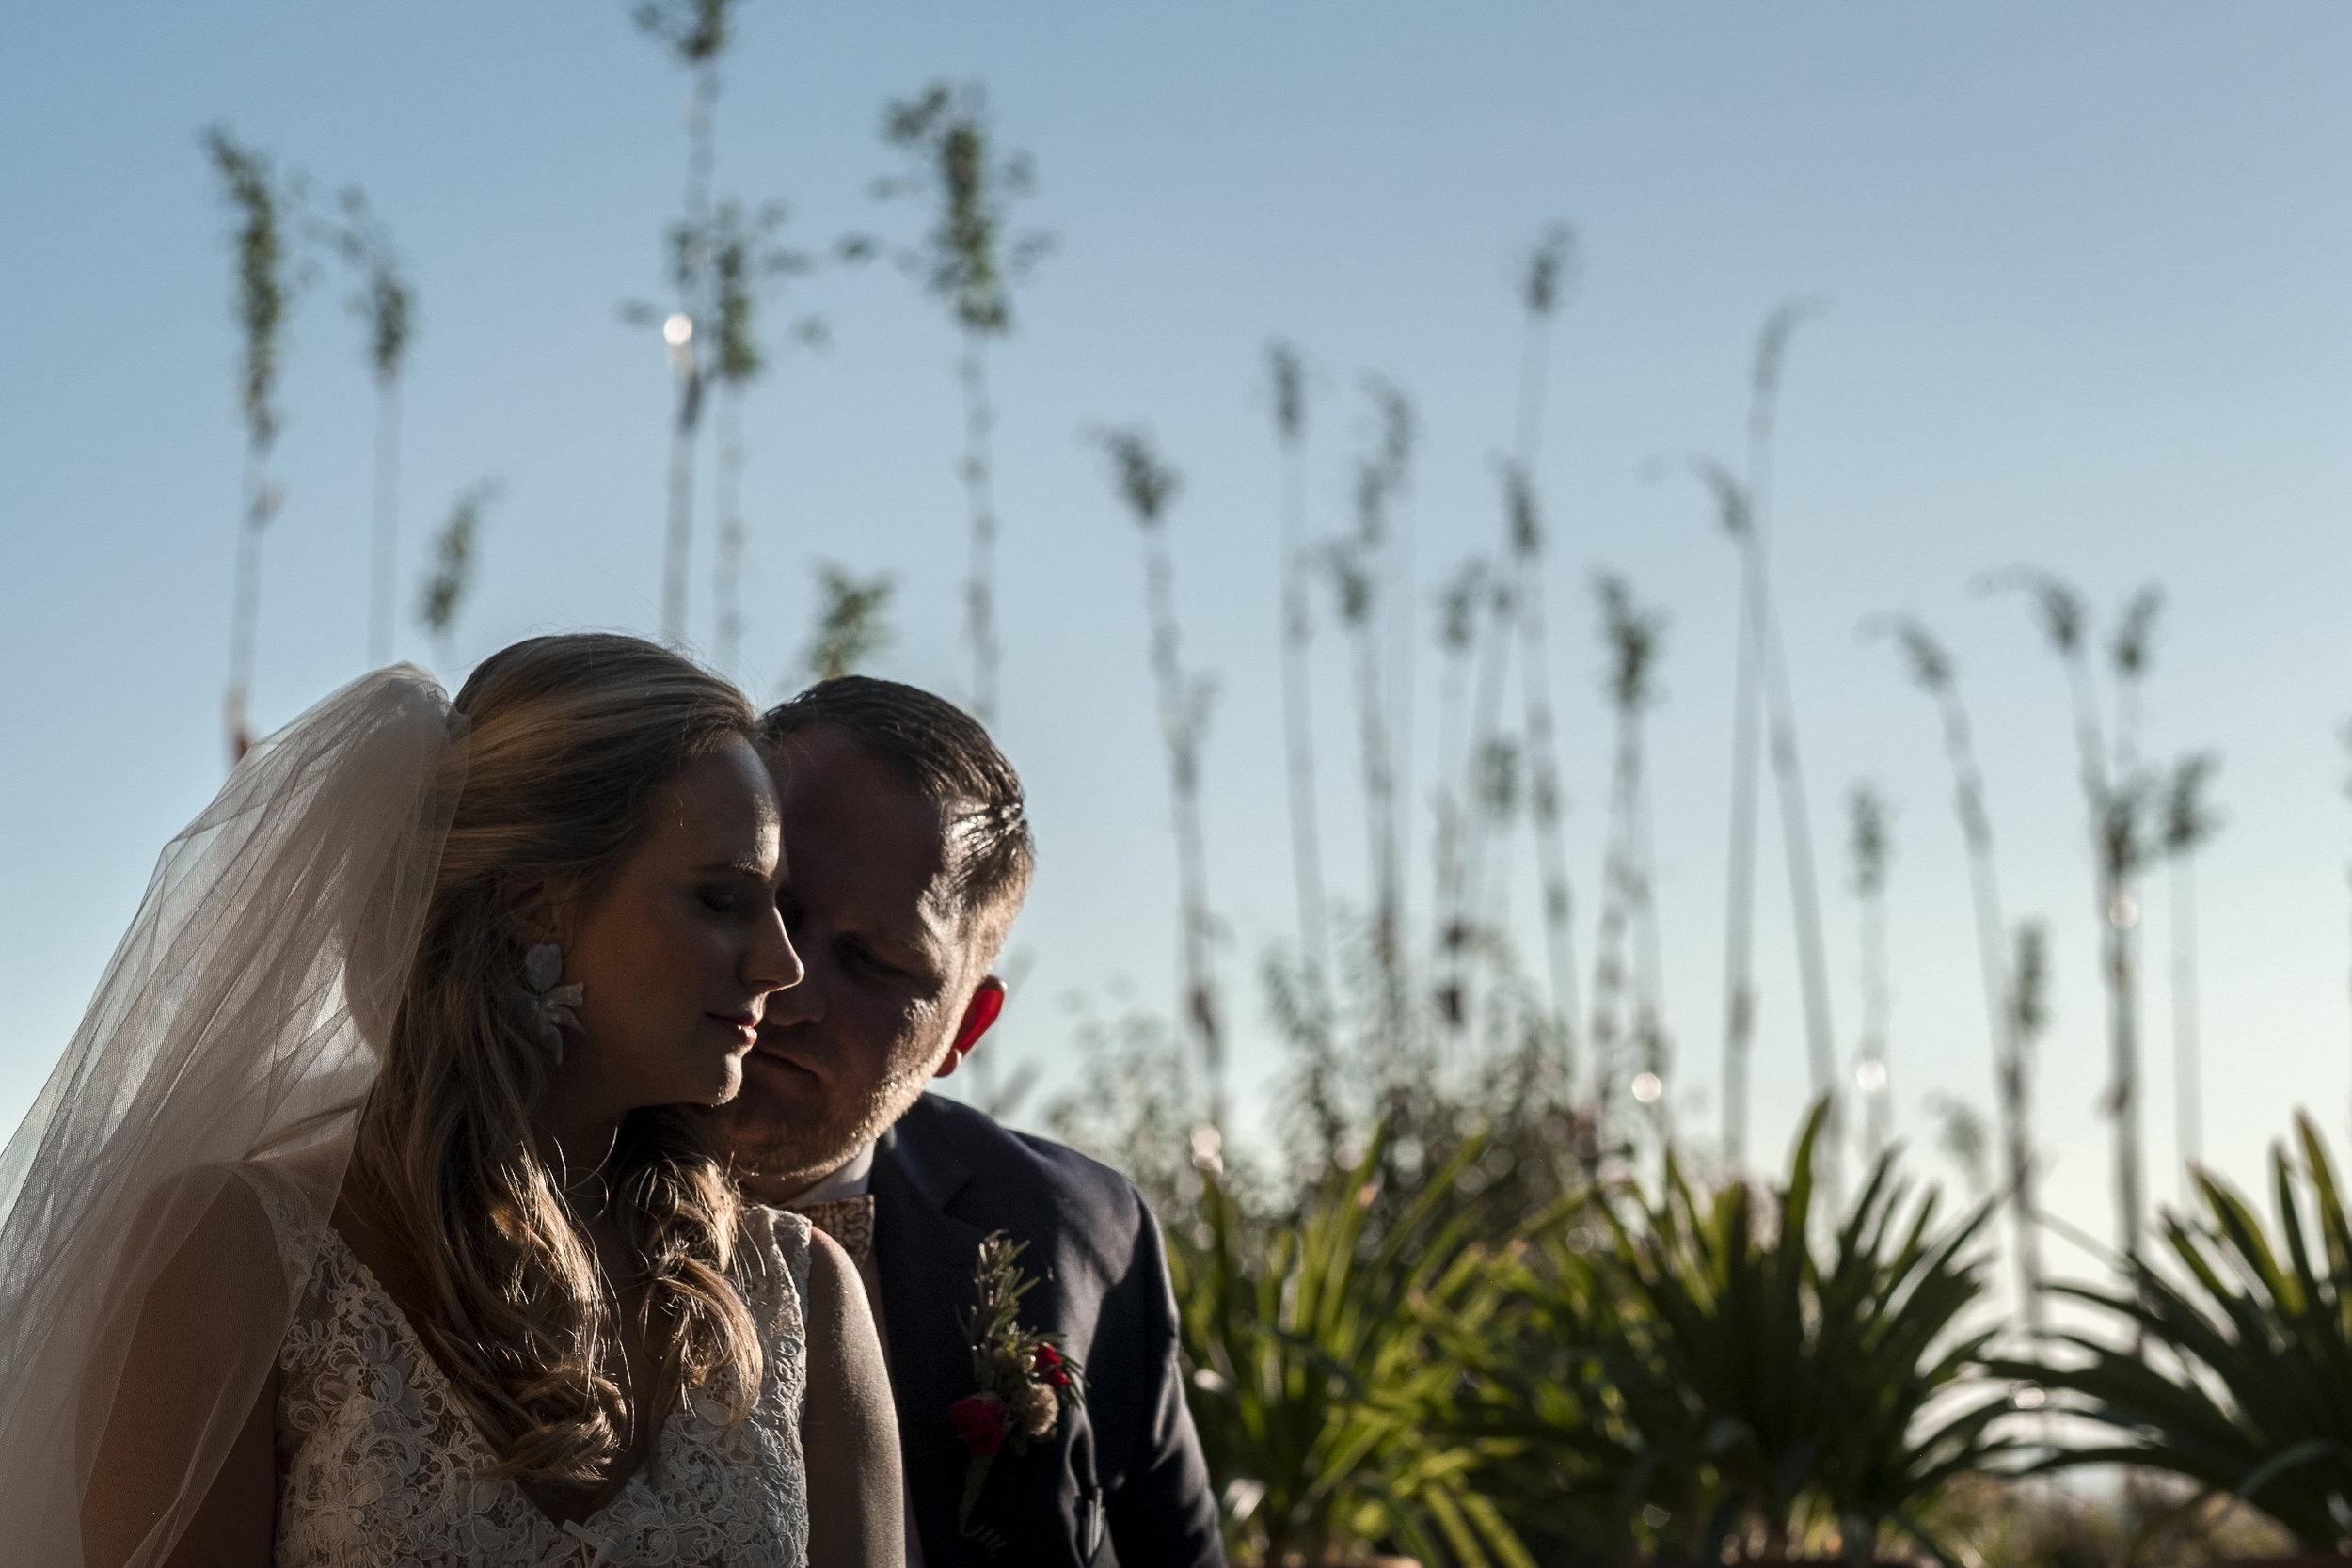 casa_chorro_wedding_san_miguel_de_allende_chio_garcia_photographer (4).jpg